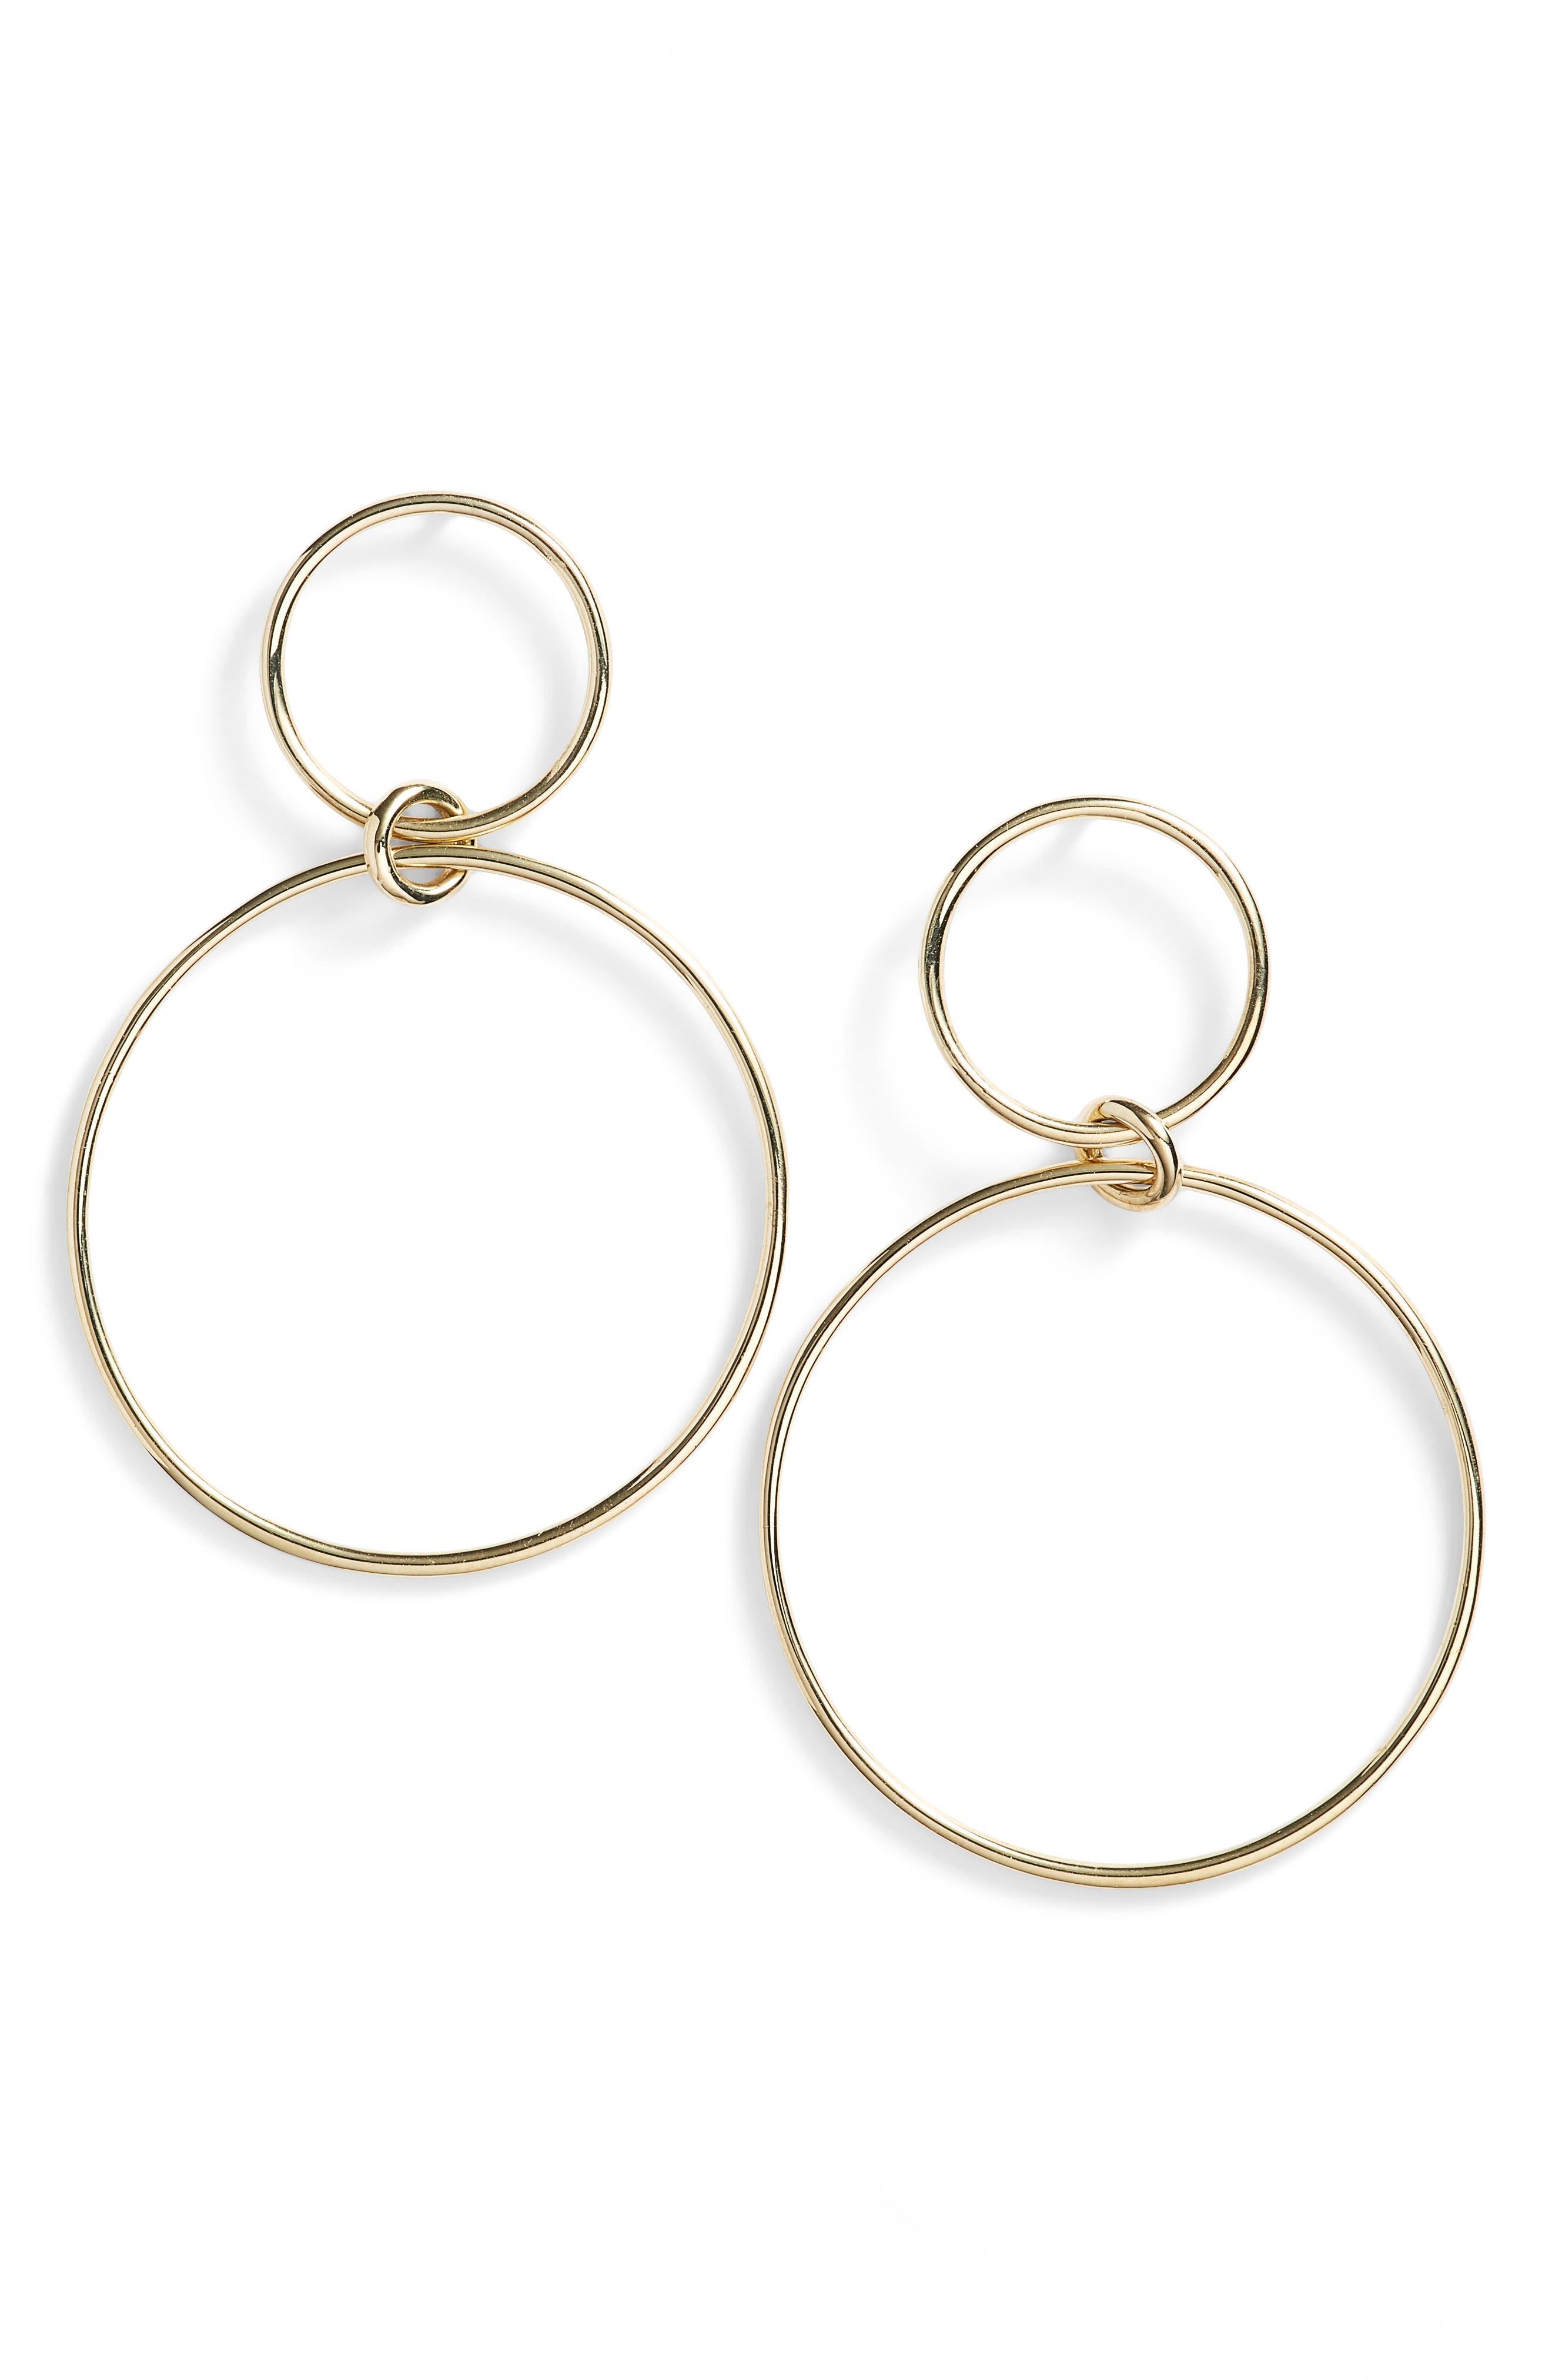 Geo Circle Drop Earrings,                             Main thumbnail 1, color,                             Yellow Gold